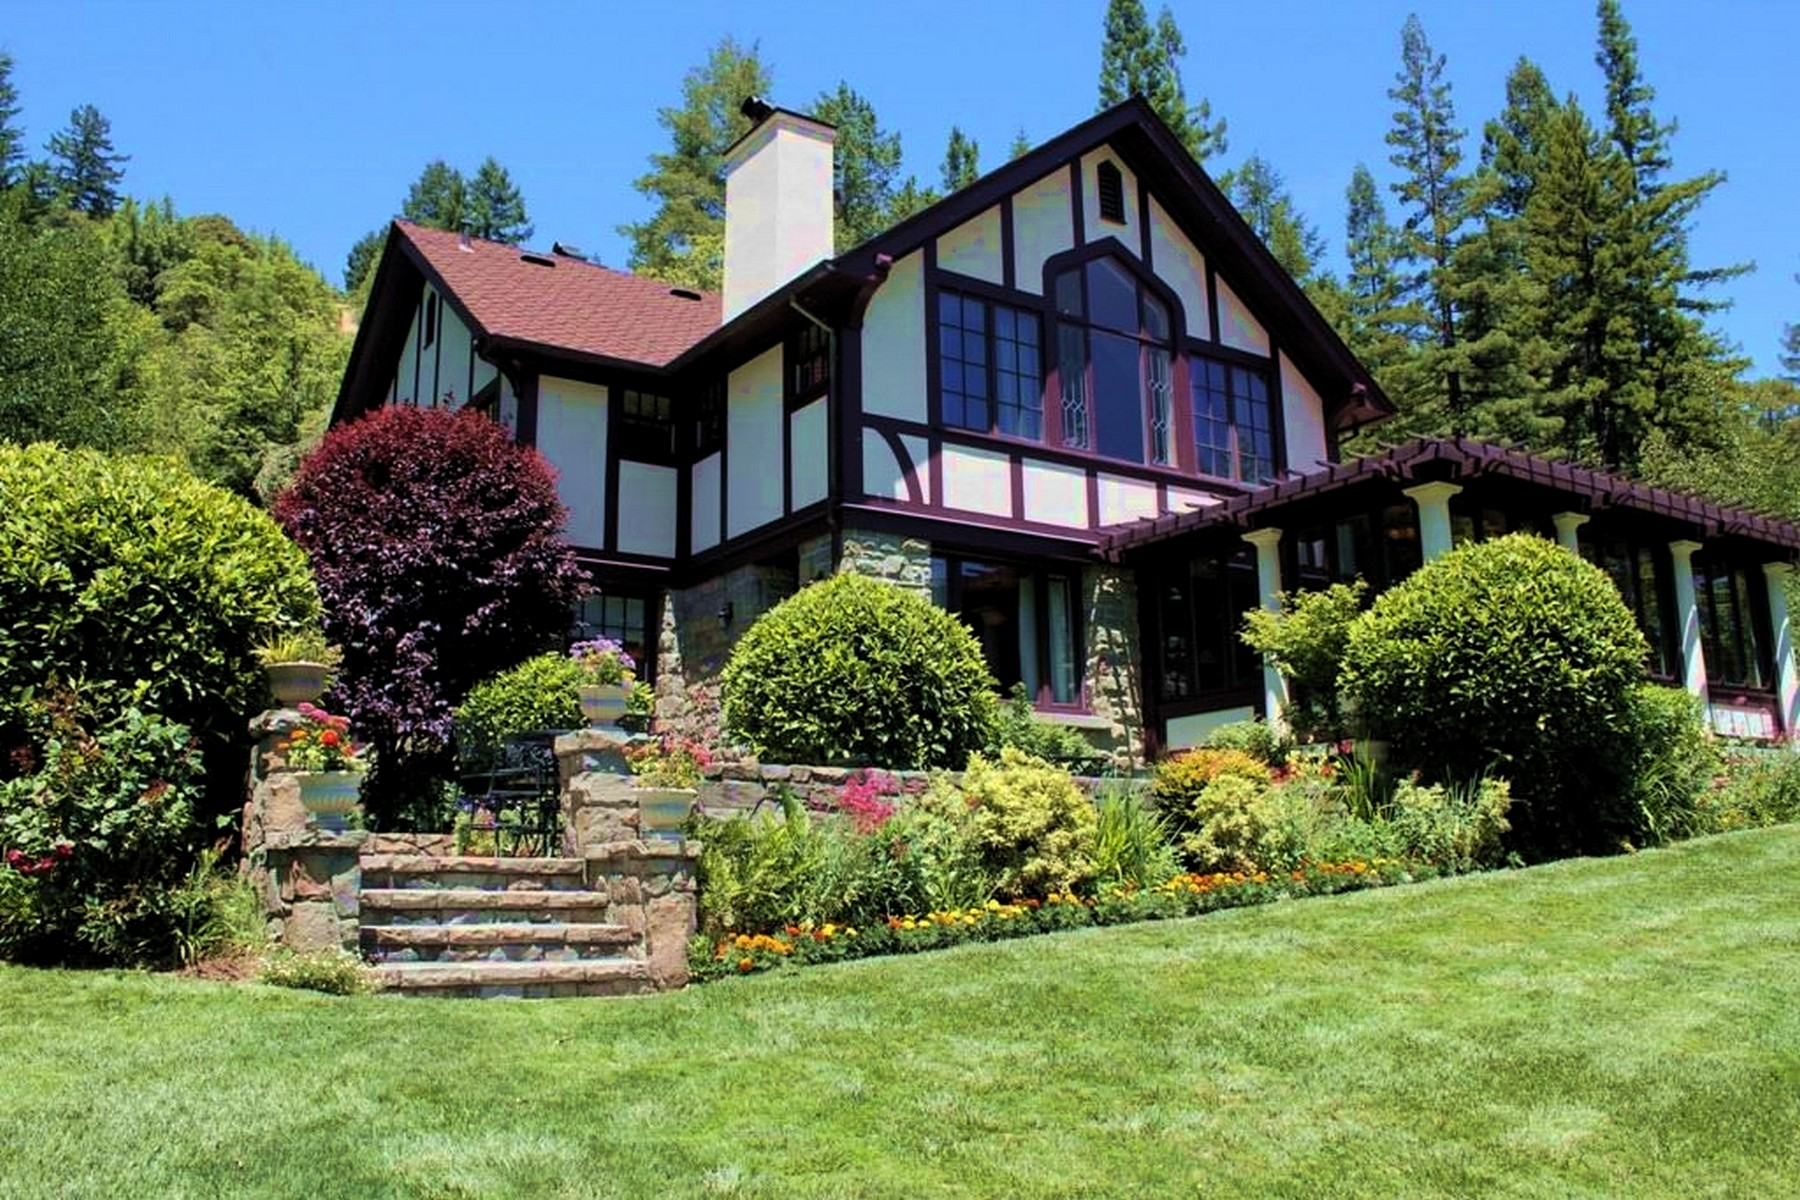 Single Family Homes for Sale at Julia Morgan Estate Garberville, California 95542 United States